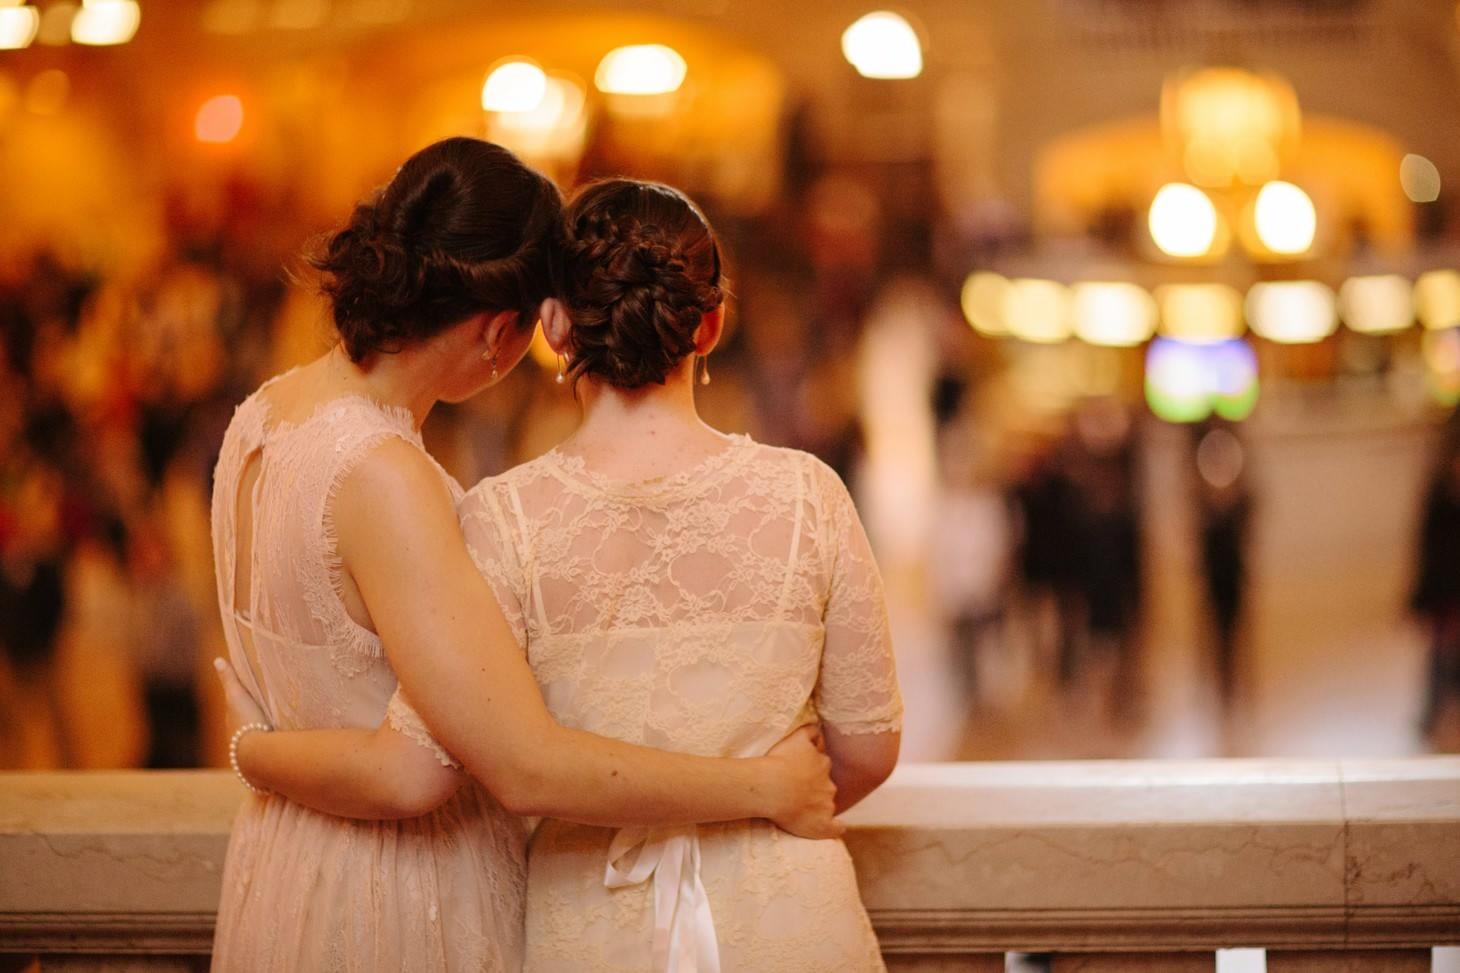 019-nyc-wedding-elopement-lgbt-friendly-photographer-city-hall-grand-central.jpg